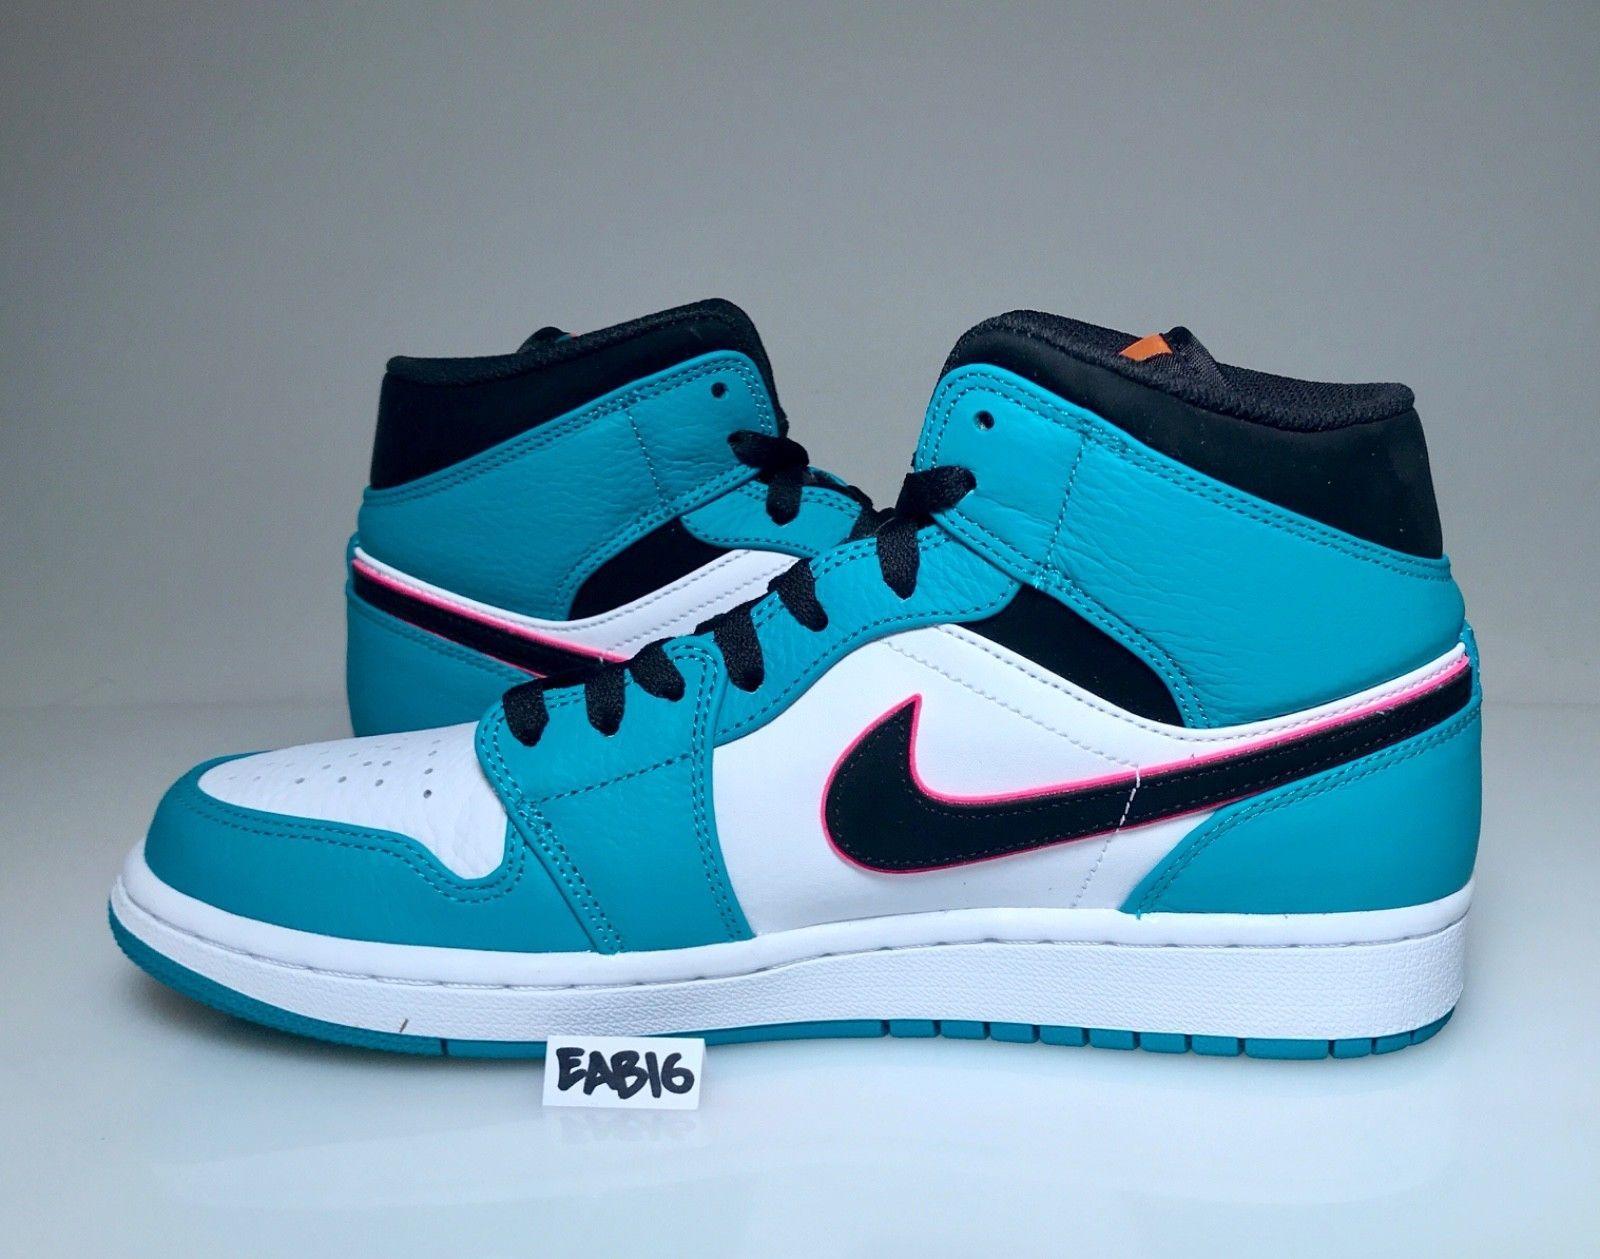 low priced 77777 be985 Nike Air Jordan 1 Mid SE Riverwalk South Beach Turbo Green Black Pink